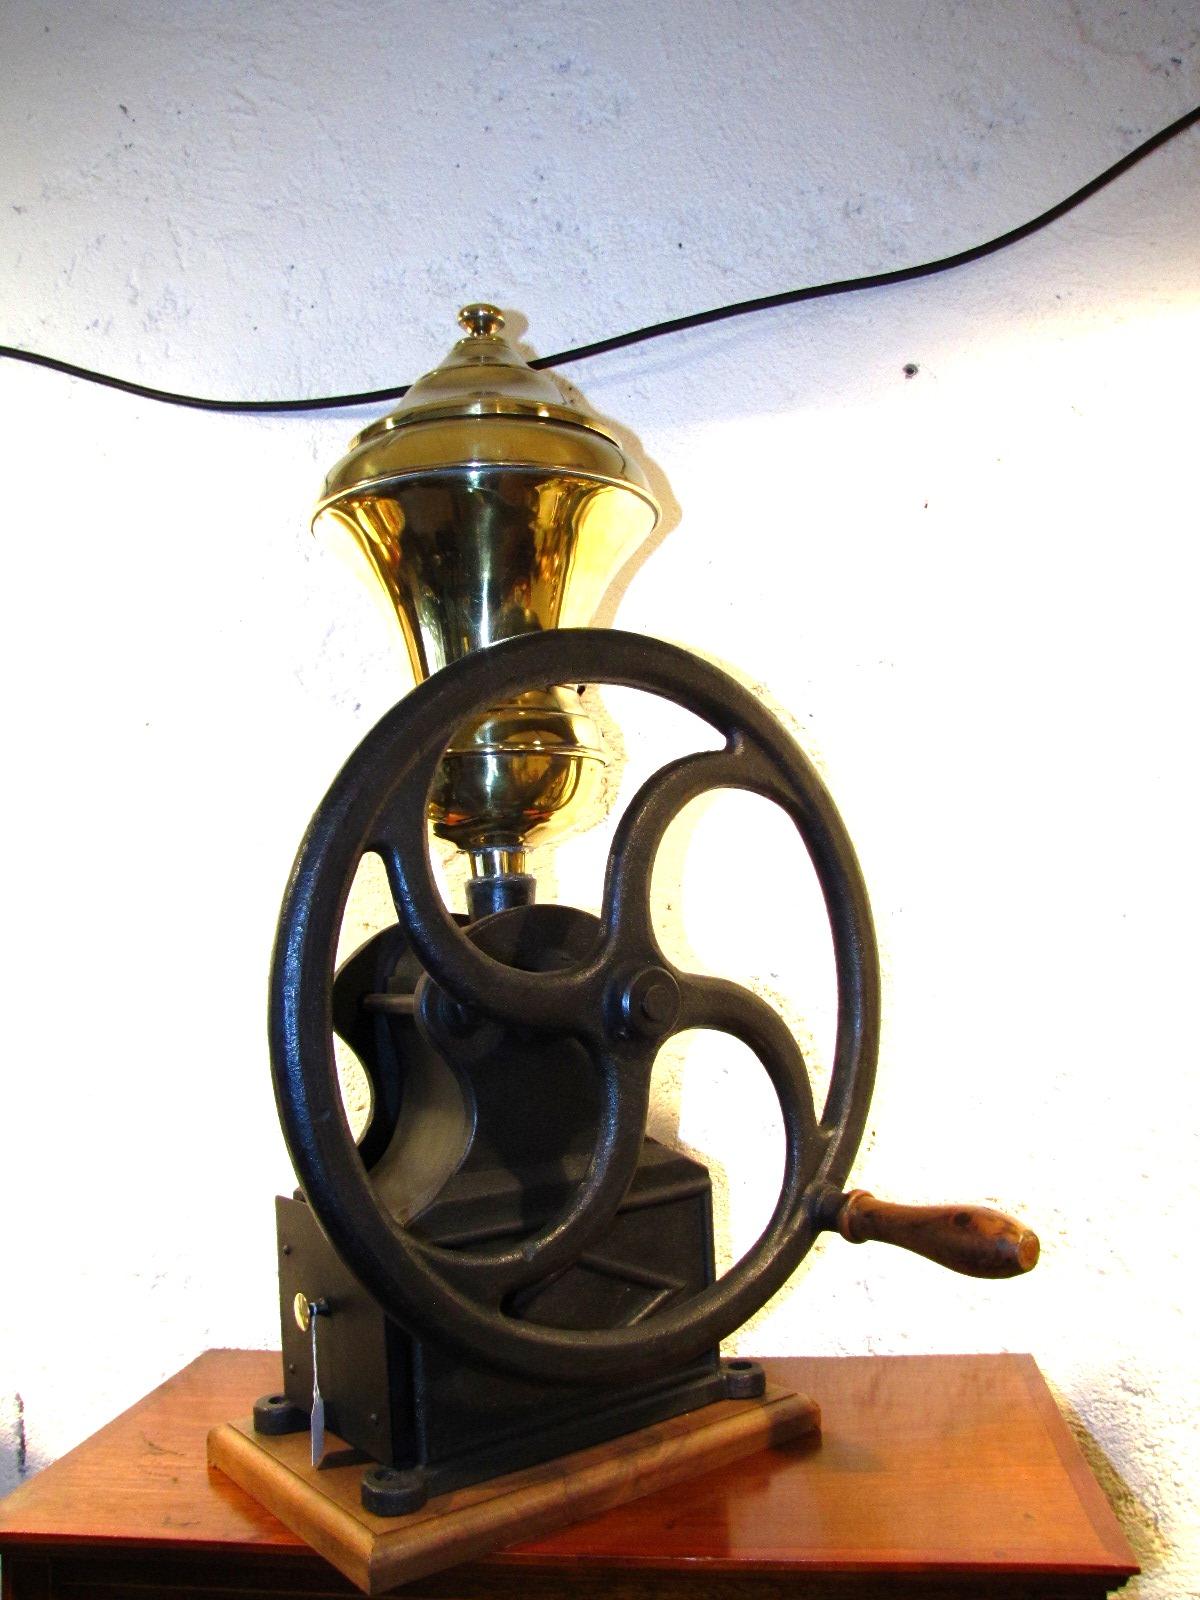 TRES GRAND MOULIN A CAFE